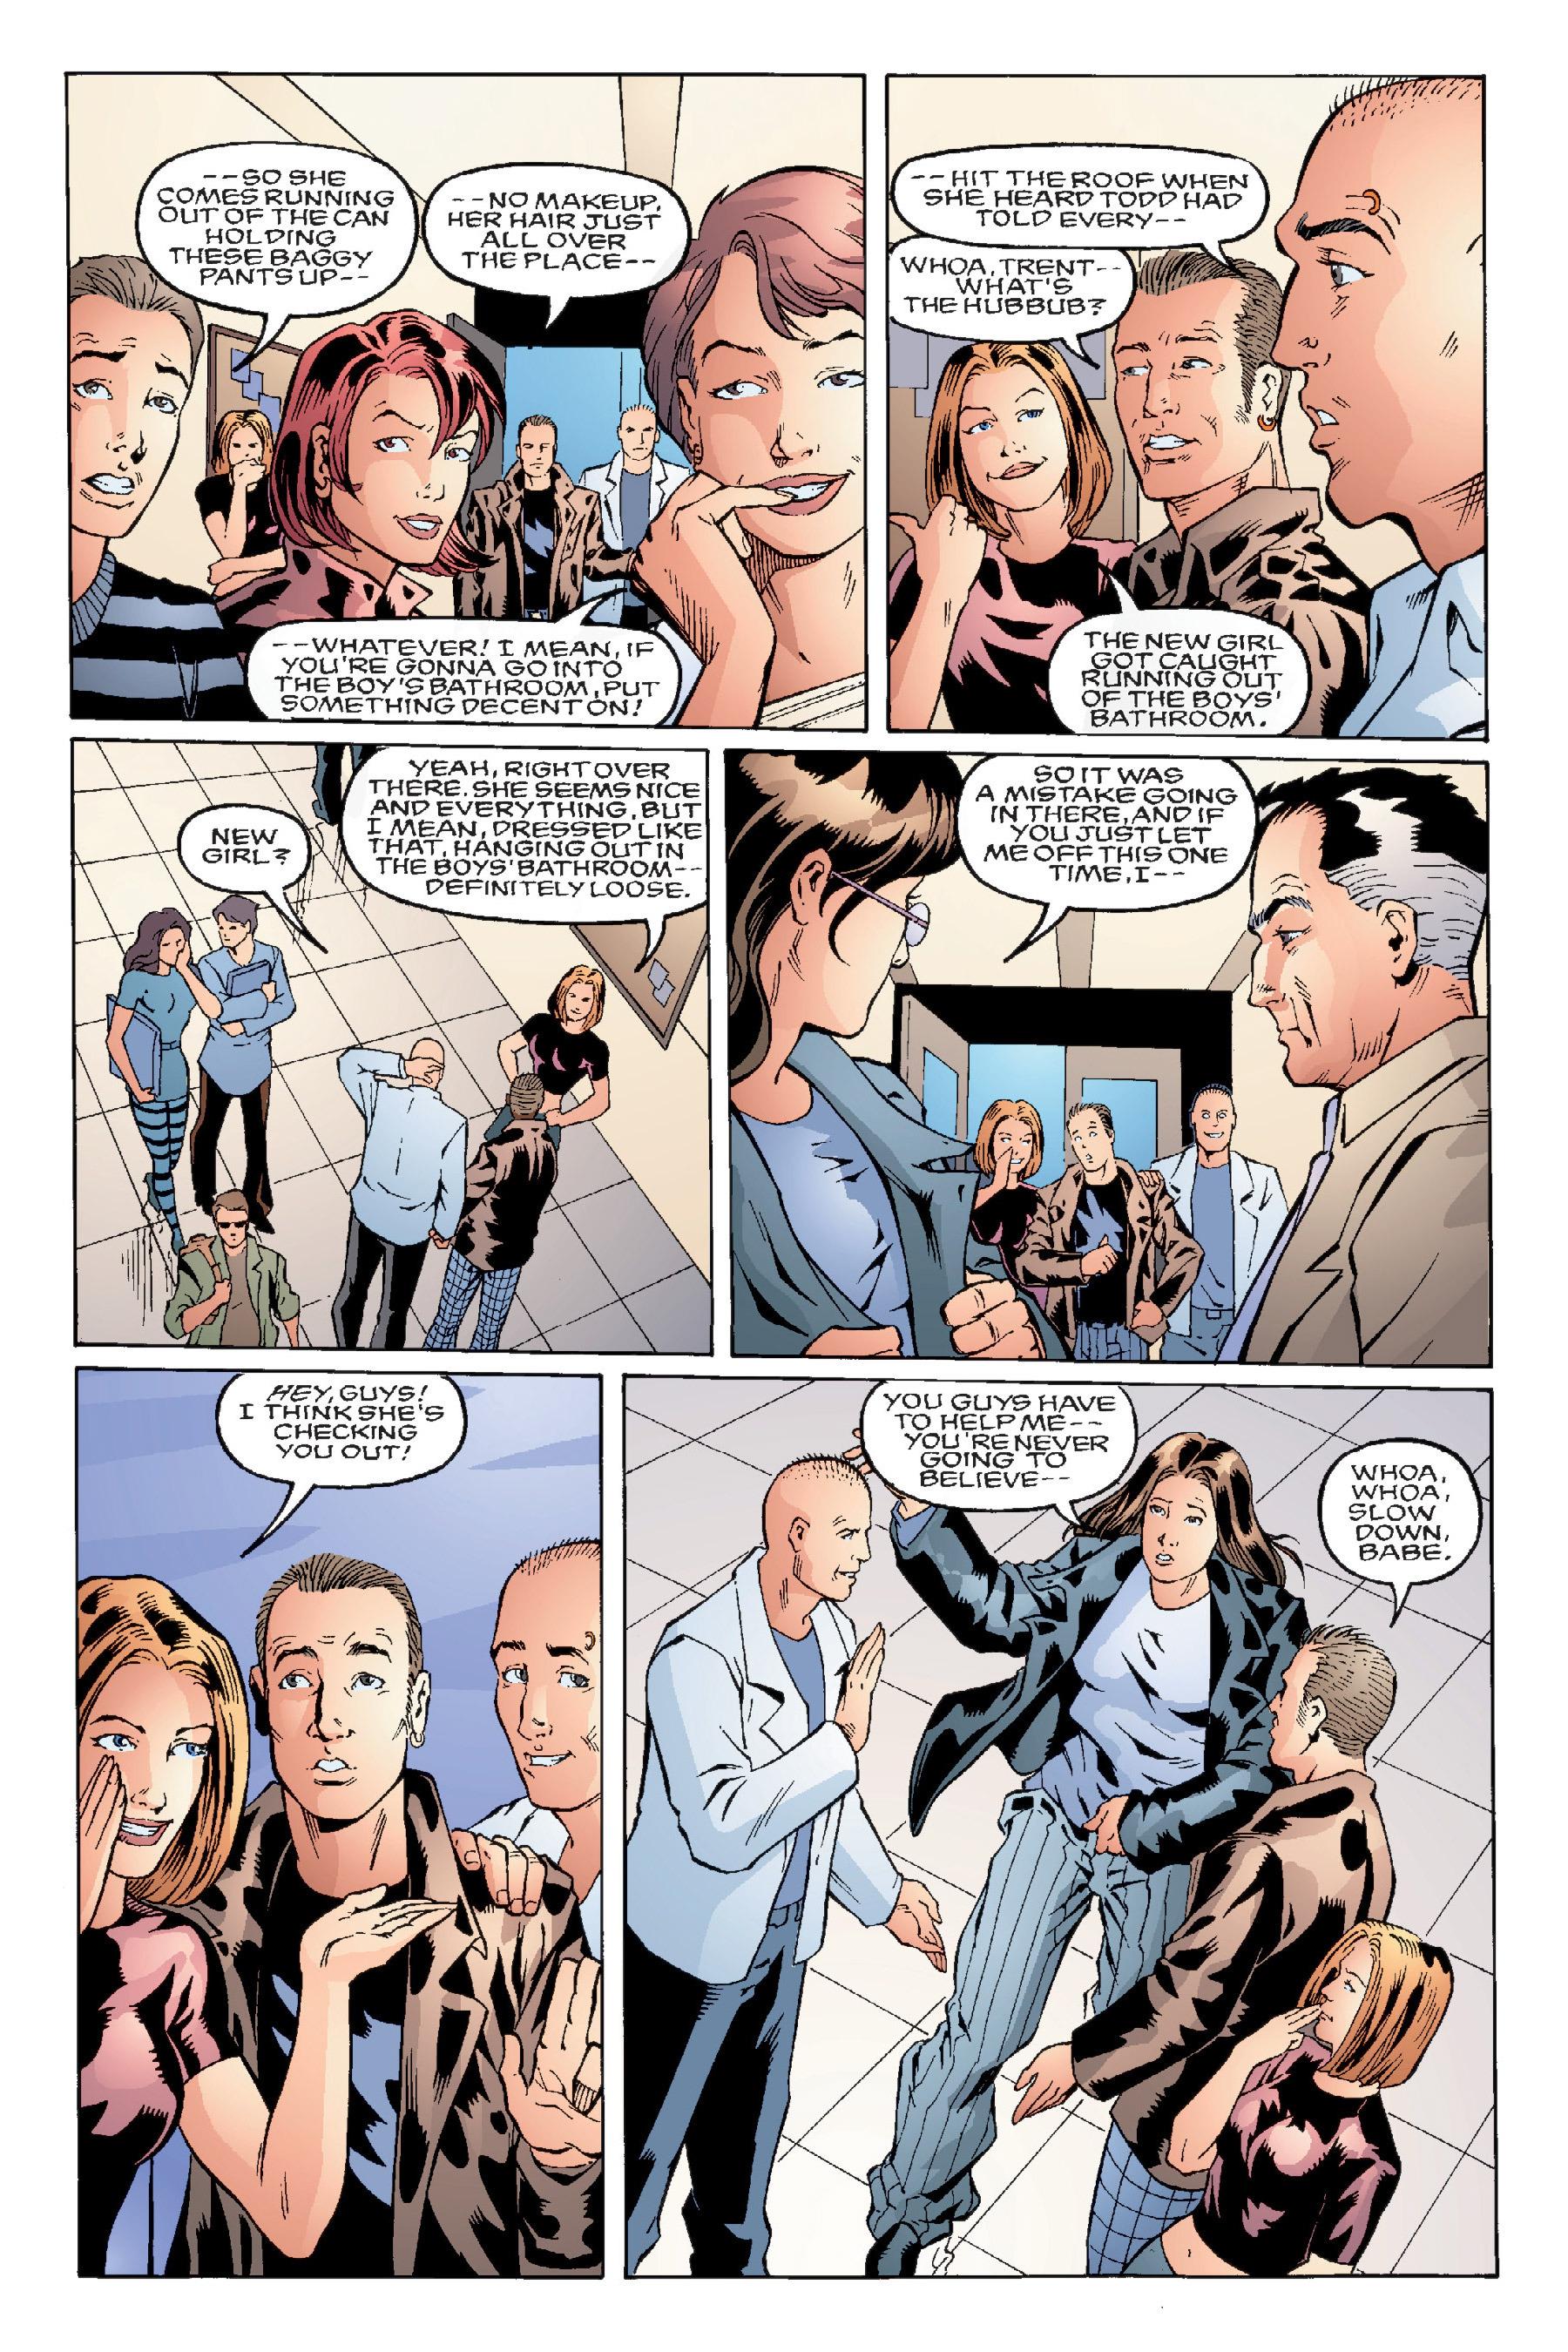 Read online Buffy the Vampire Slayer: Omnibus comic -  Issue # TPB 4 - 71